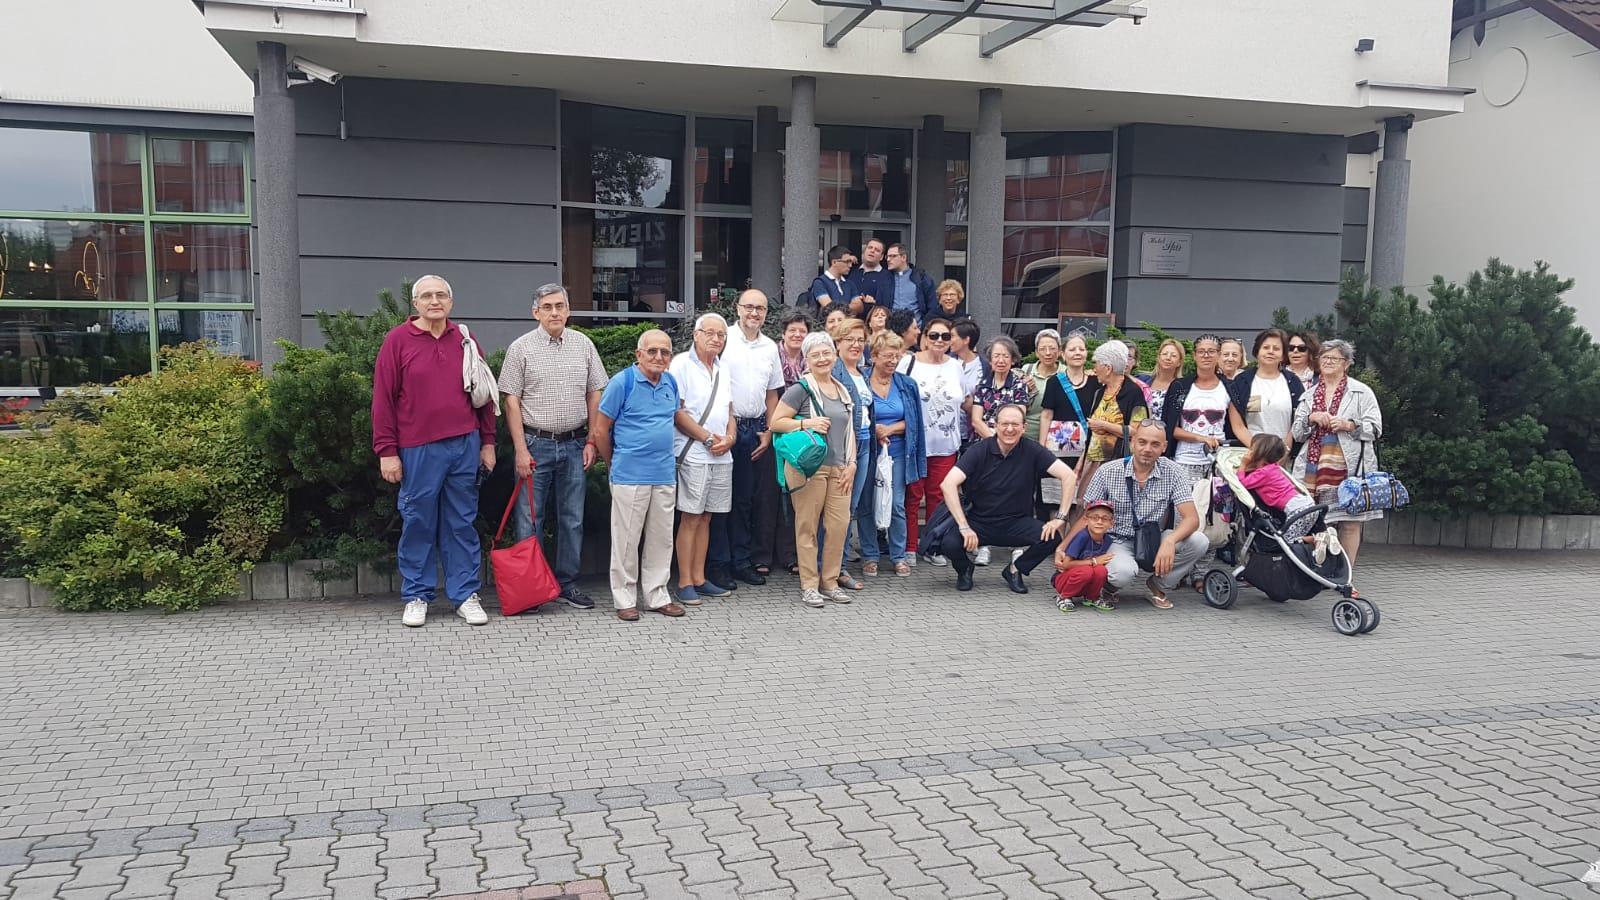 Polonia 2018_Sulle orme di Giovanni Paolo II e Santa Faustina